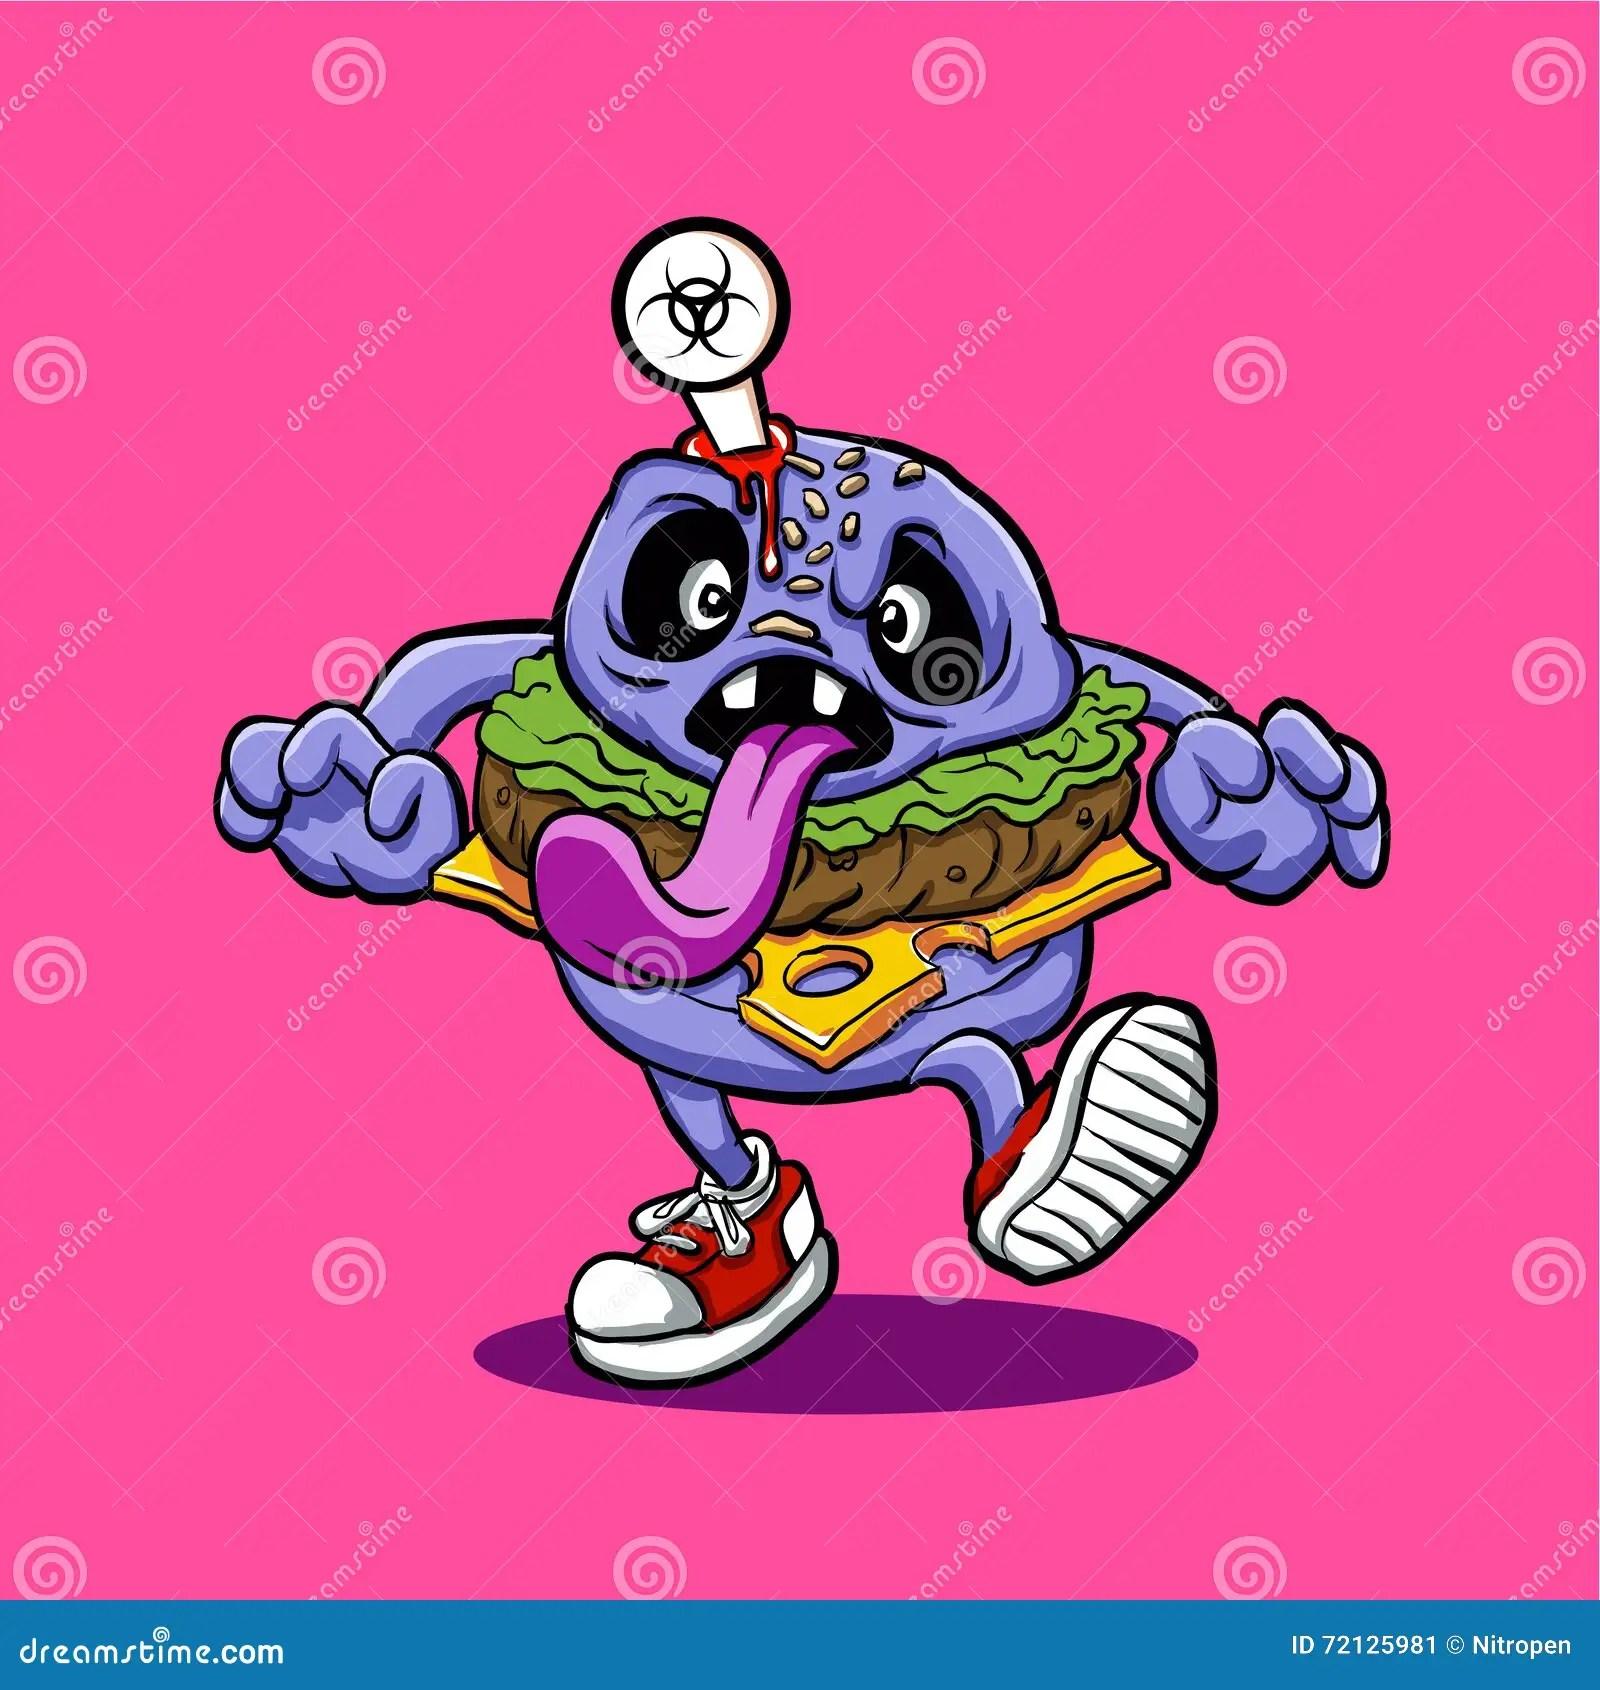 Cute Emoji Iphone Wallpapers Zombie Burger Cartoon Burger Stock Vector Image 72125981